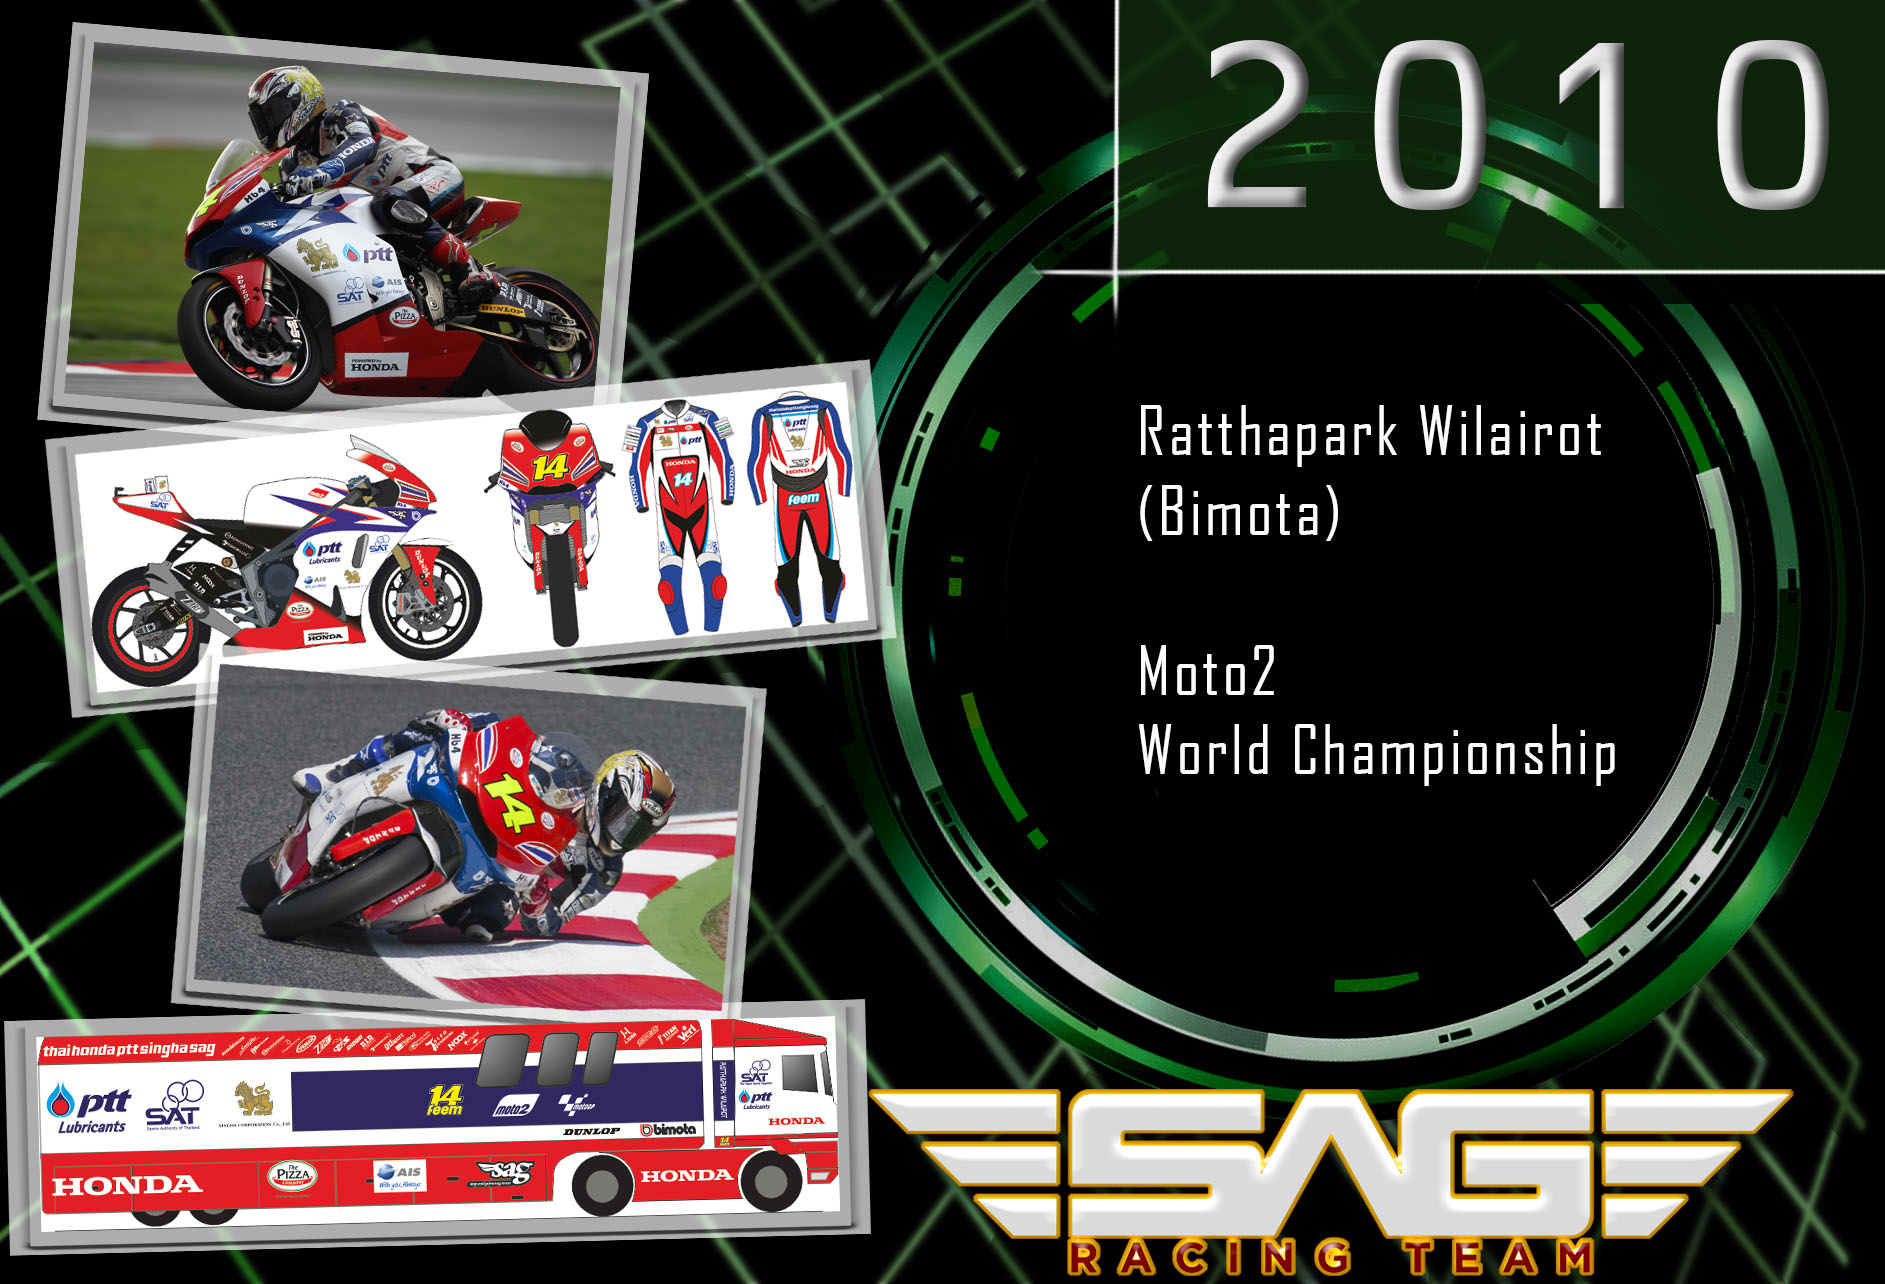 World Championship rider Ratthapark Wilairot